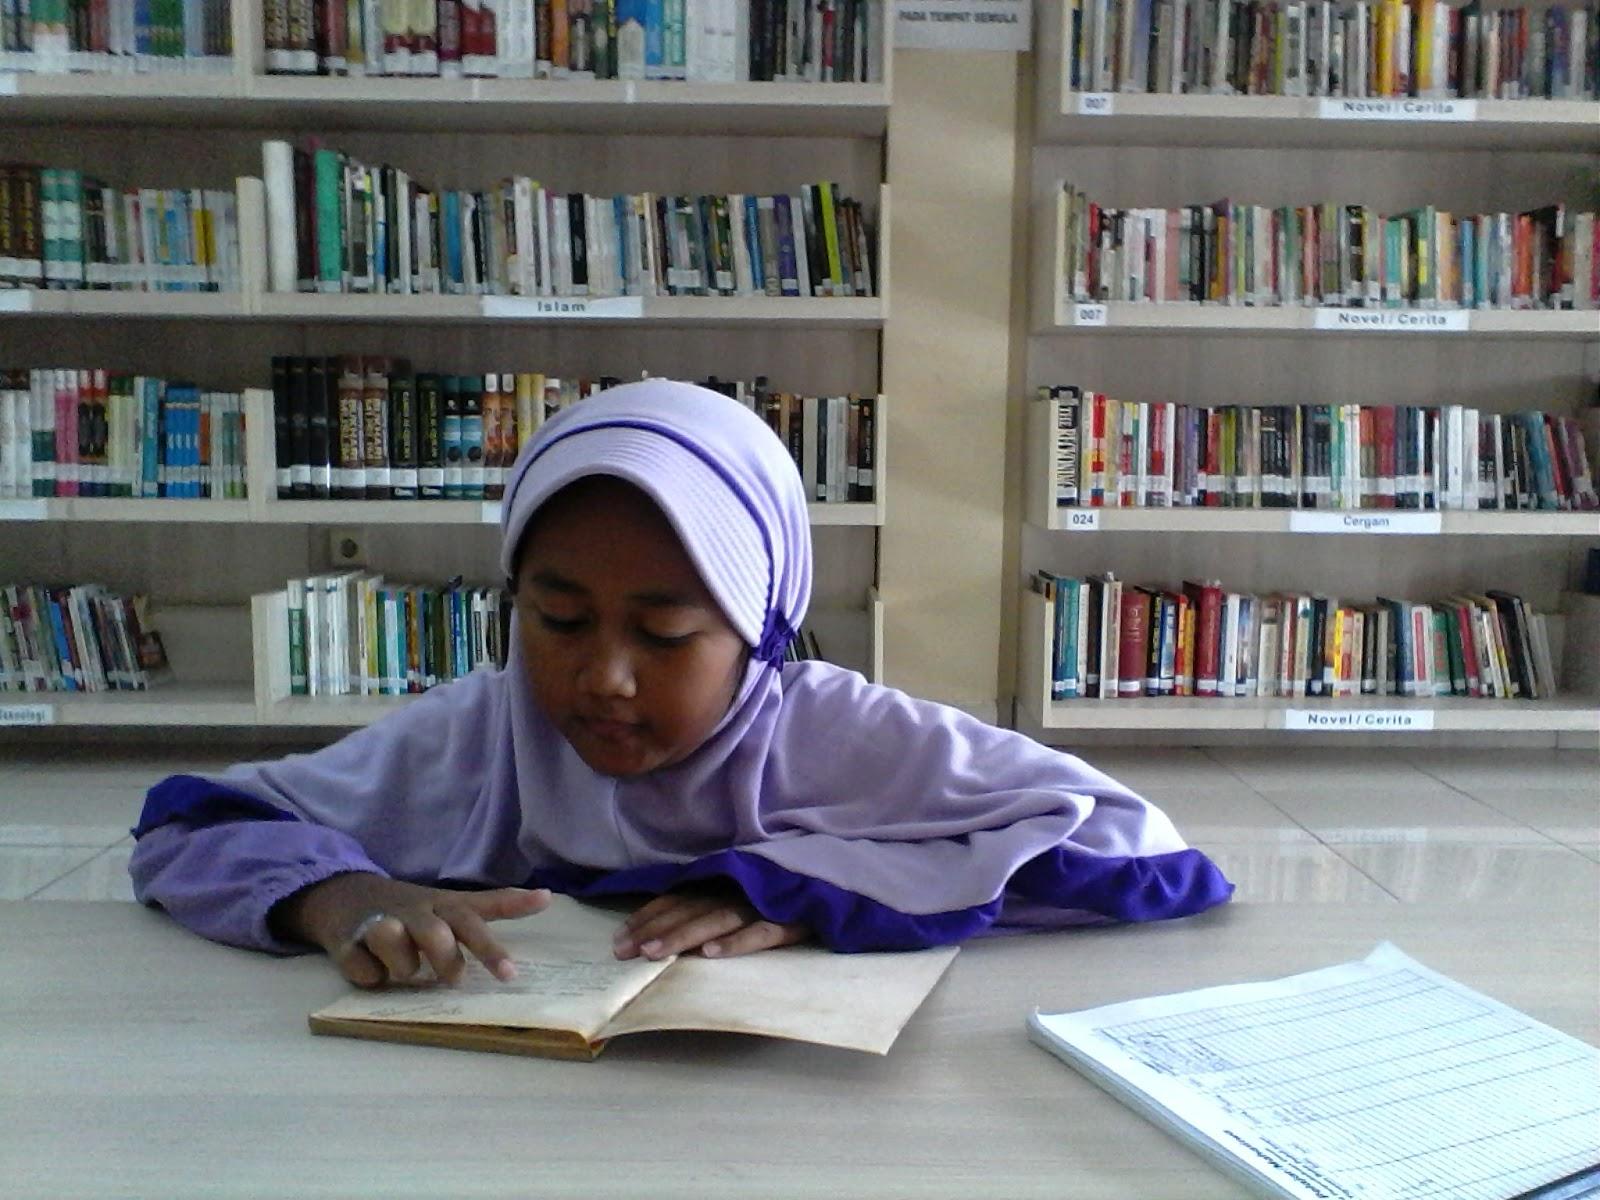 Inilah Ucapan Syifa yang Menyebabkan Abinya Segera Mengajaknya Berkunjung ke Perpustakaan